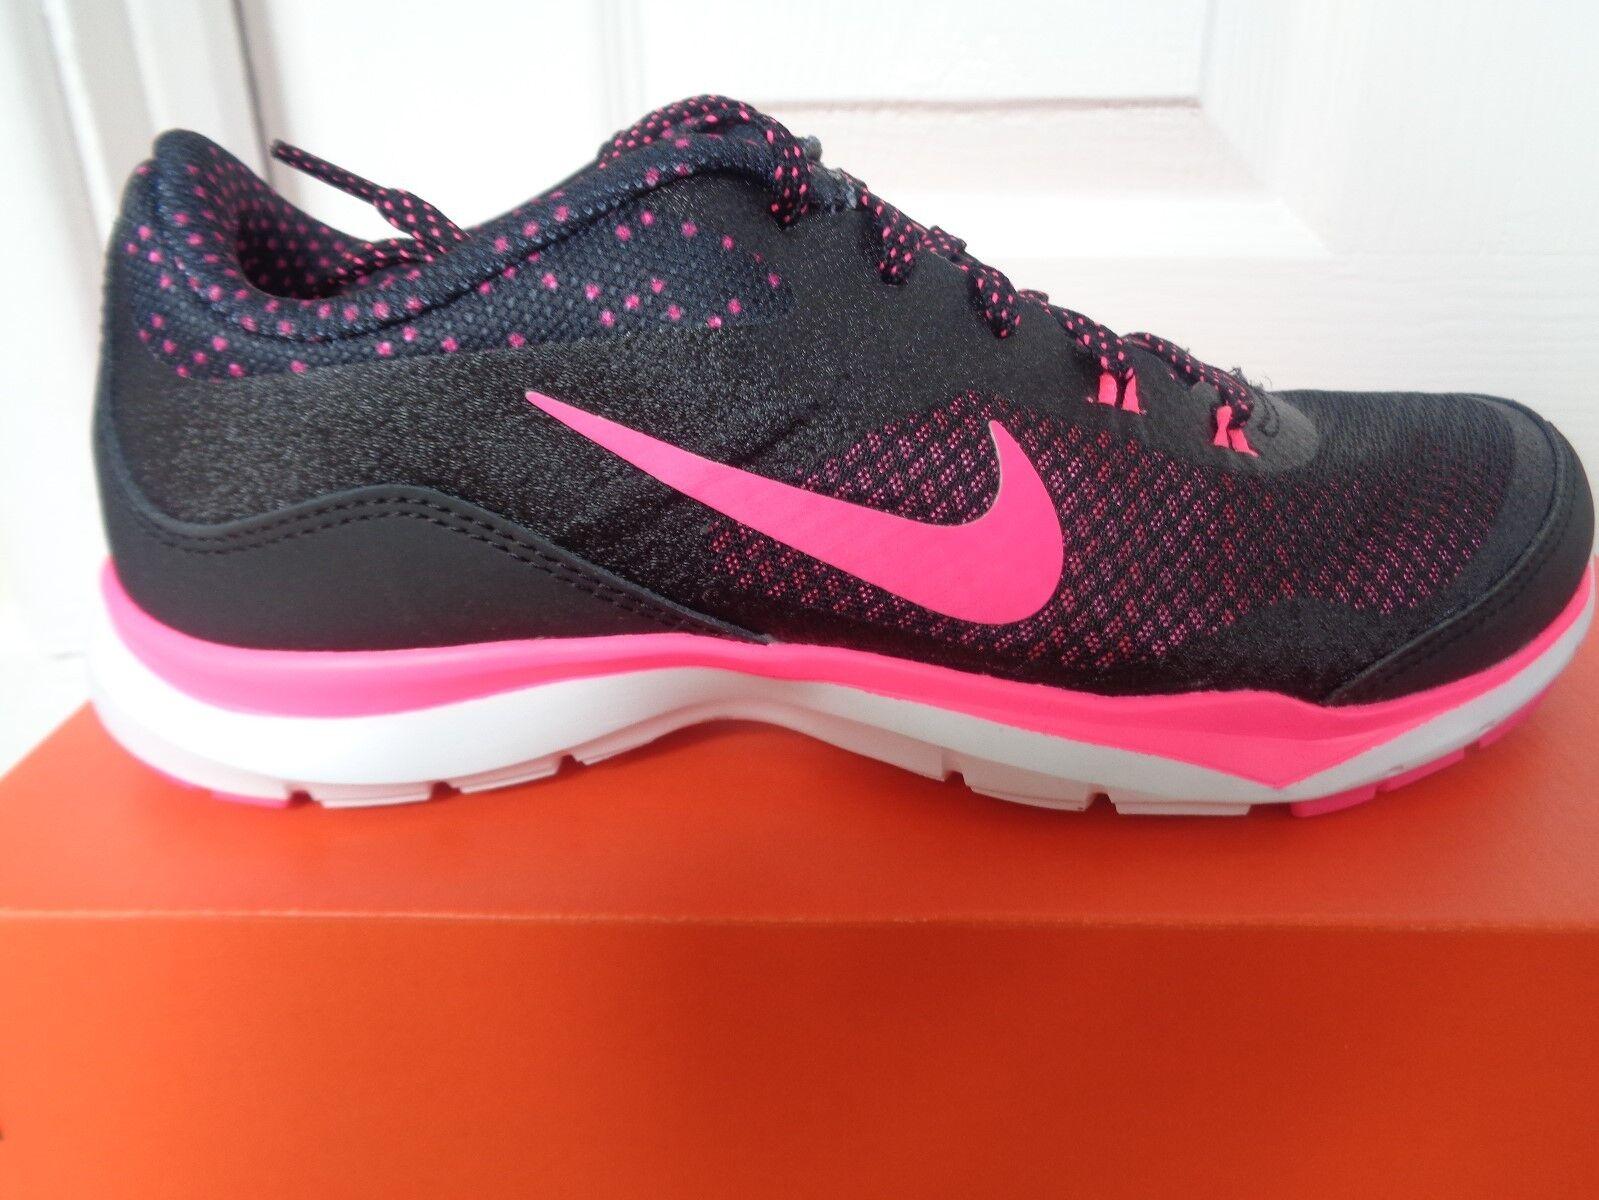 Nike Flex Trainer 5 Print Wmns Baskets 749184 018 UK 4 EU 37.5 US 6.5 Neuf + Boîte